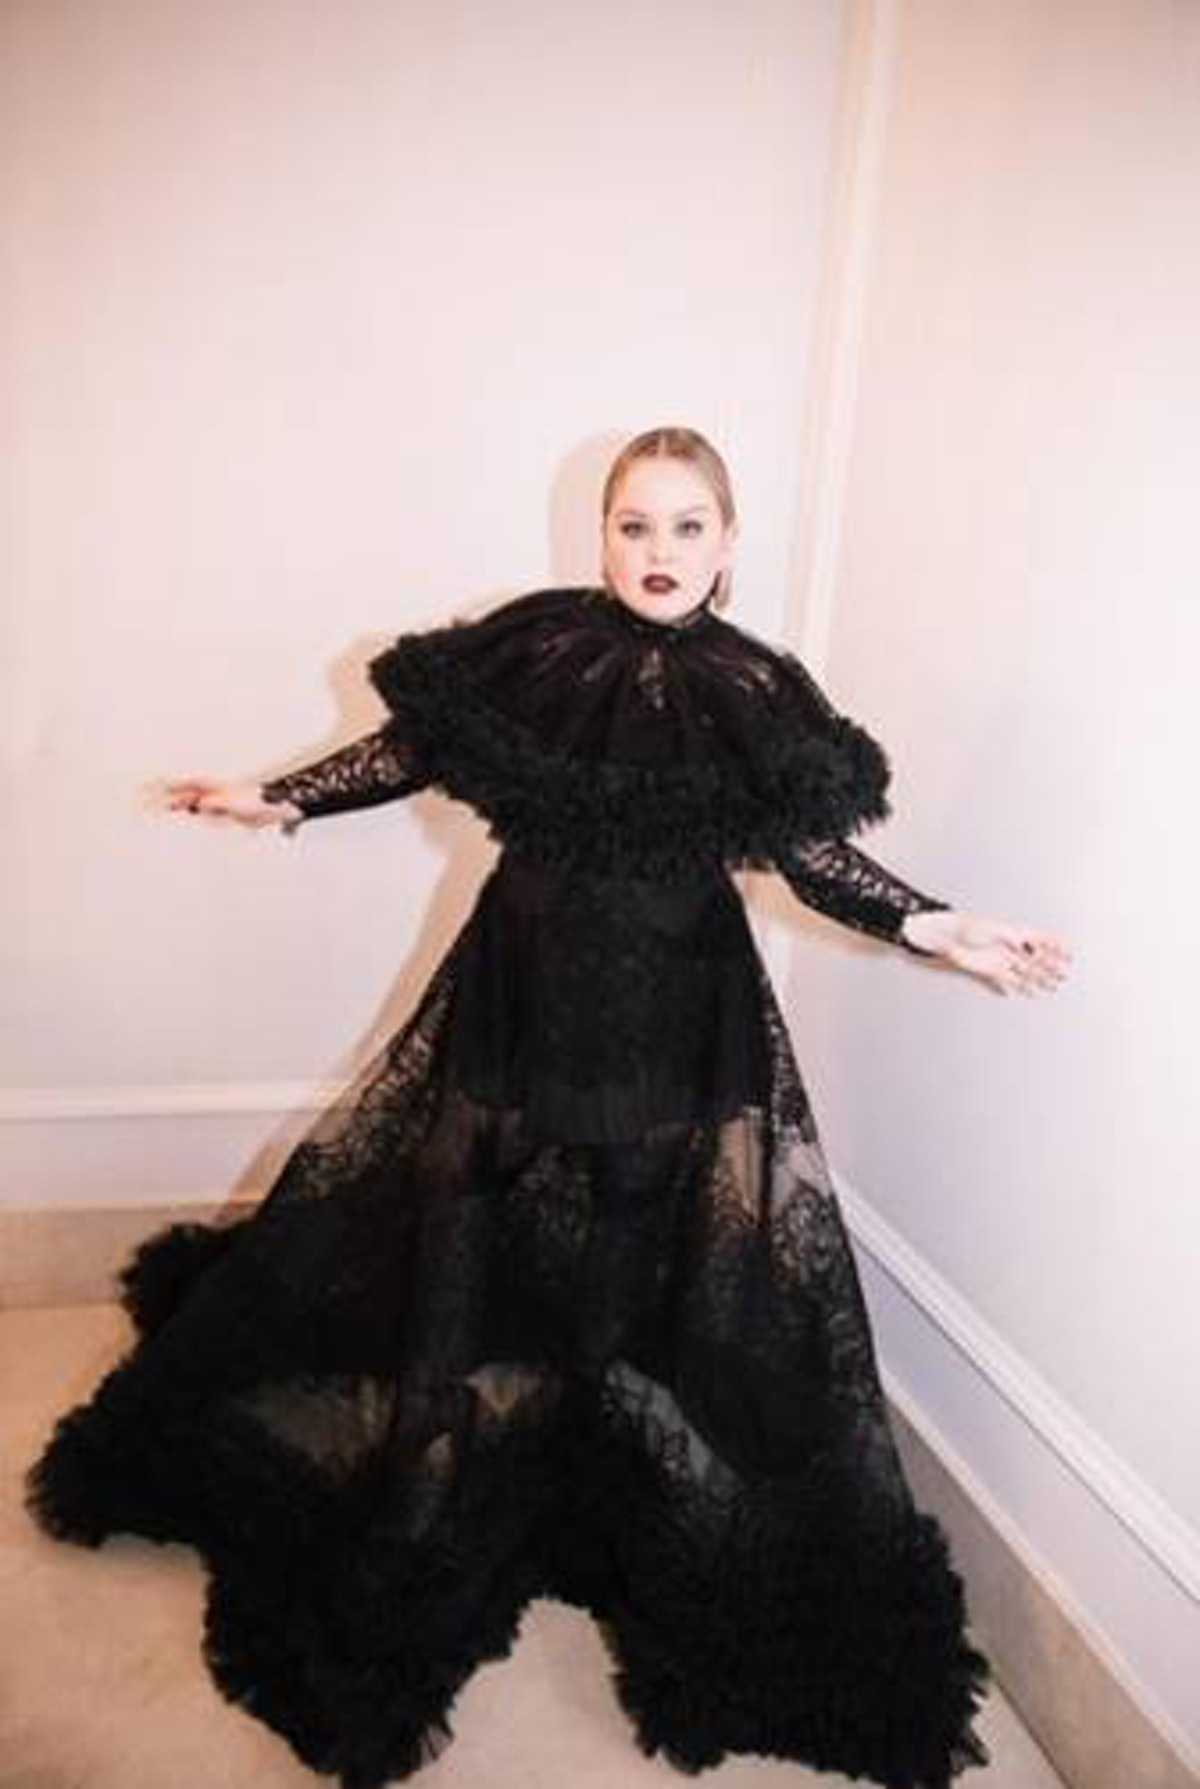 Nicolah Coughlan in black Christian Siriano dress